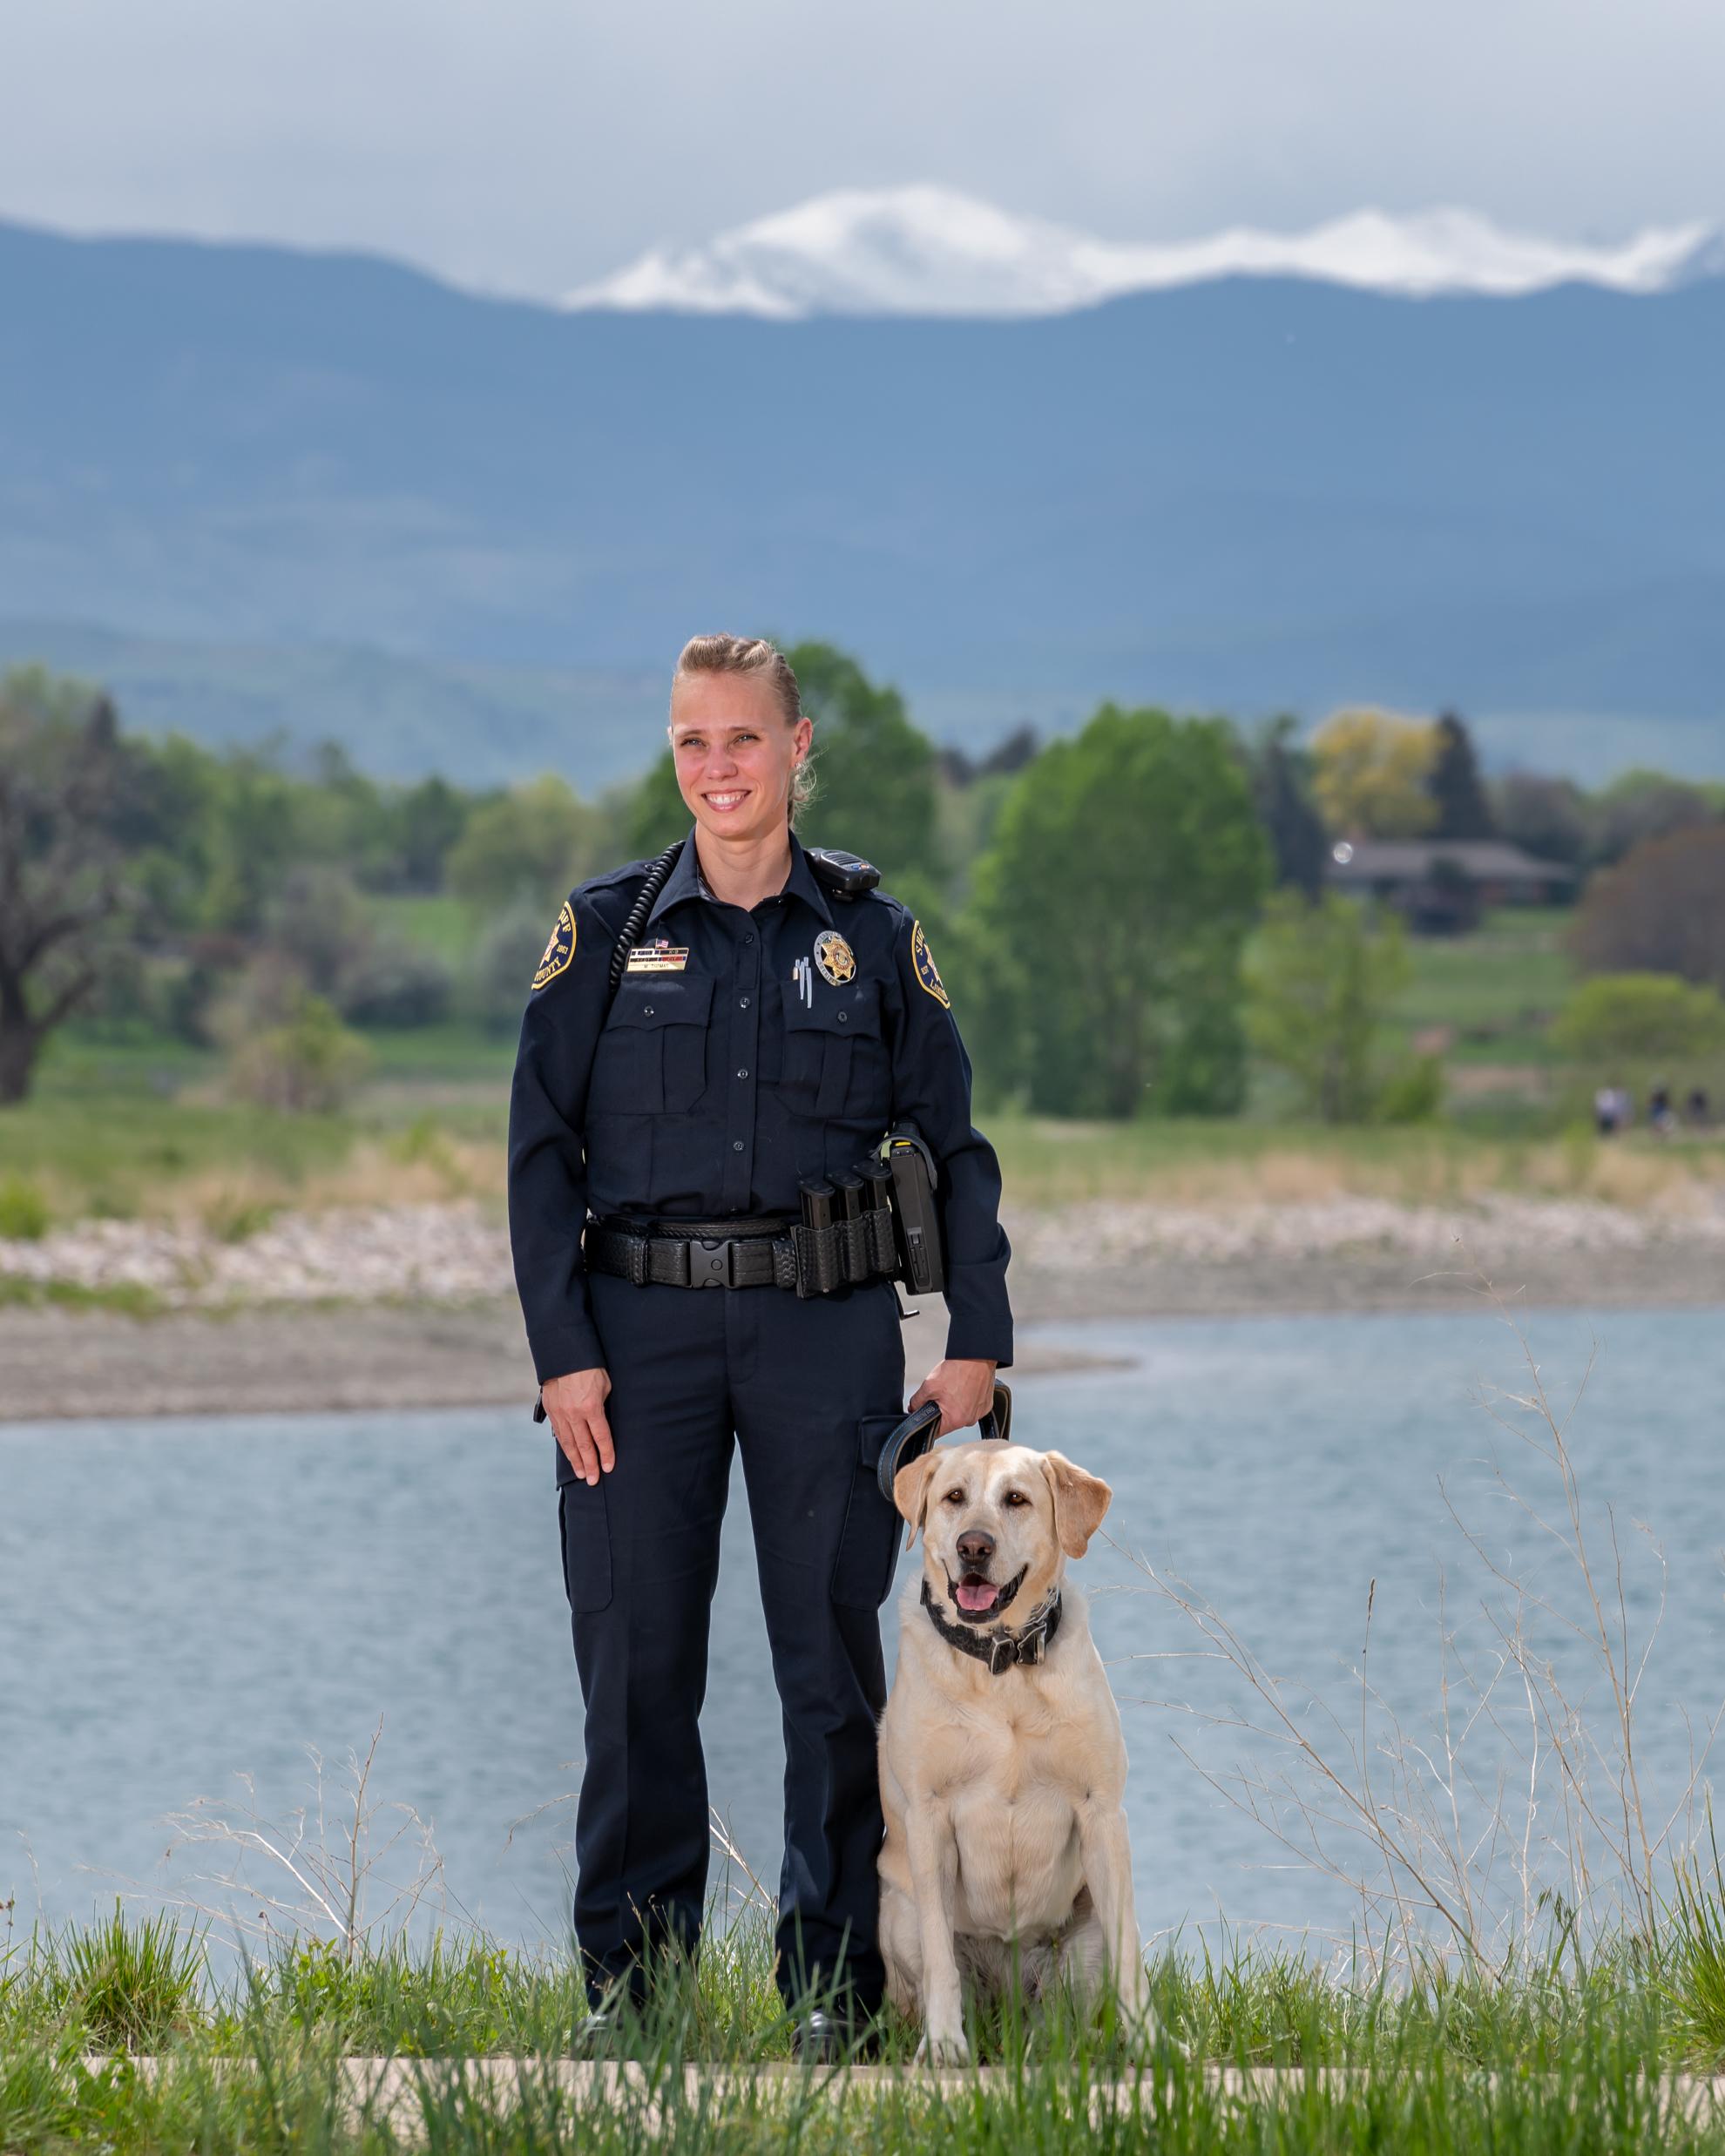 Image 6: Deputy Megan Thomas and K9 Maizey (Yellow Lab)